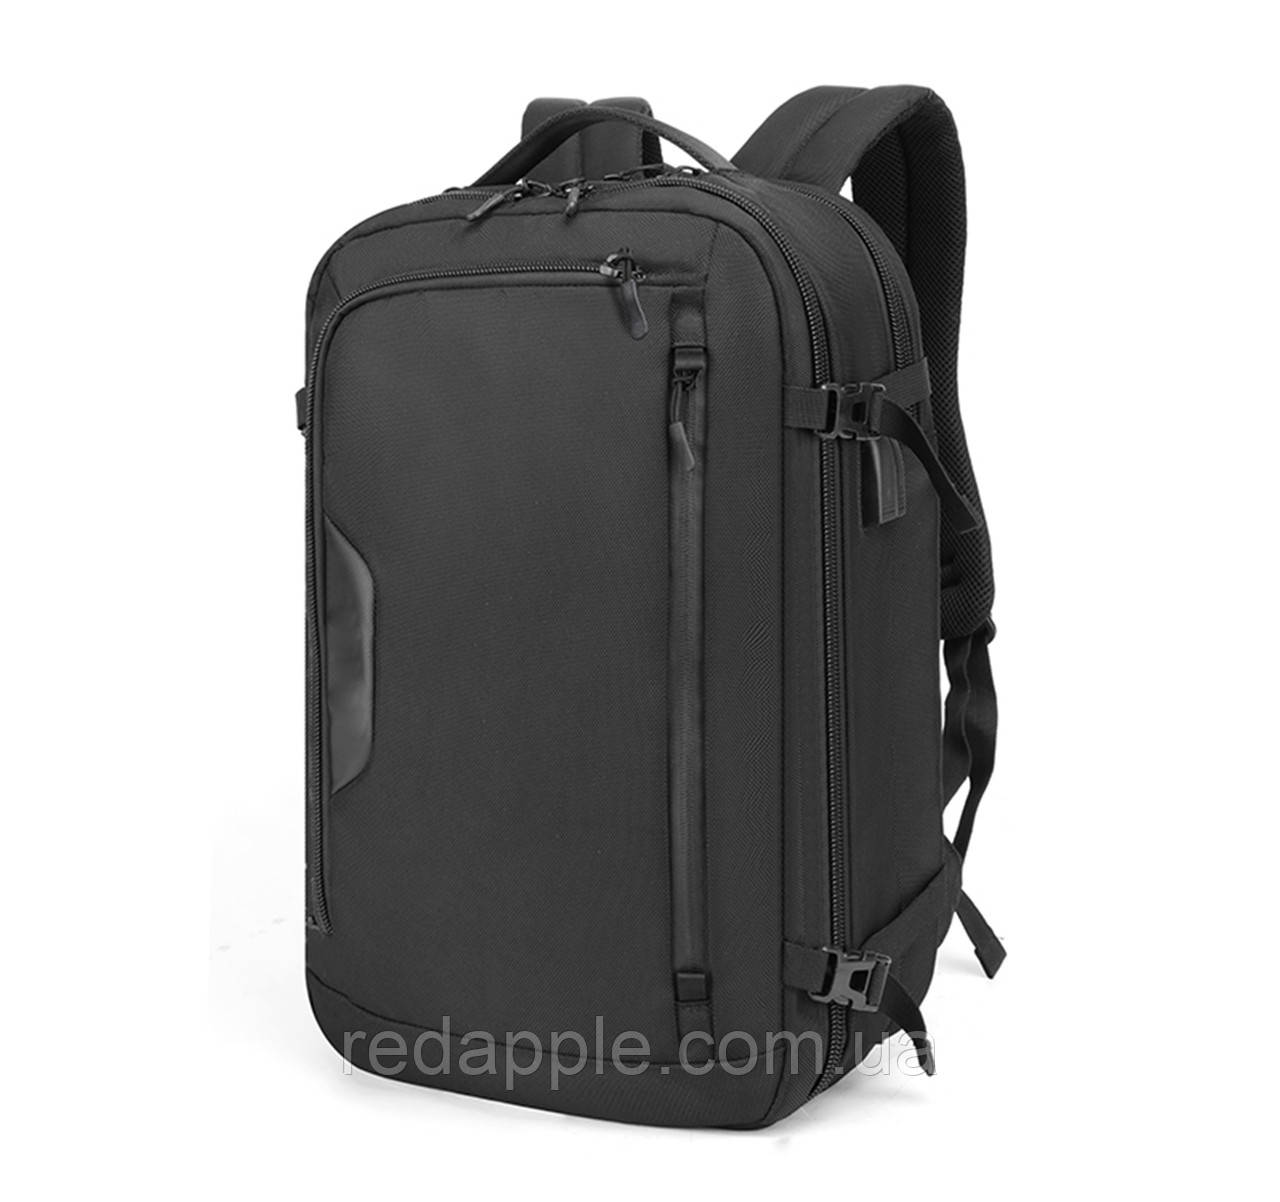 Рюкзак для ноутбука  Overland, TM Discover